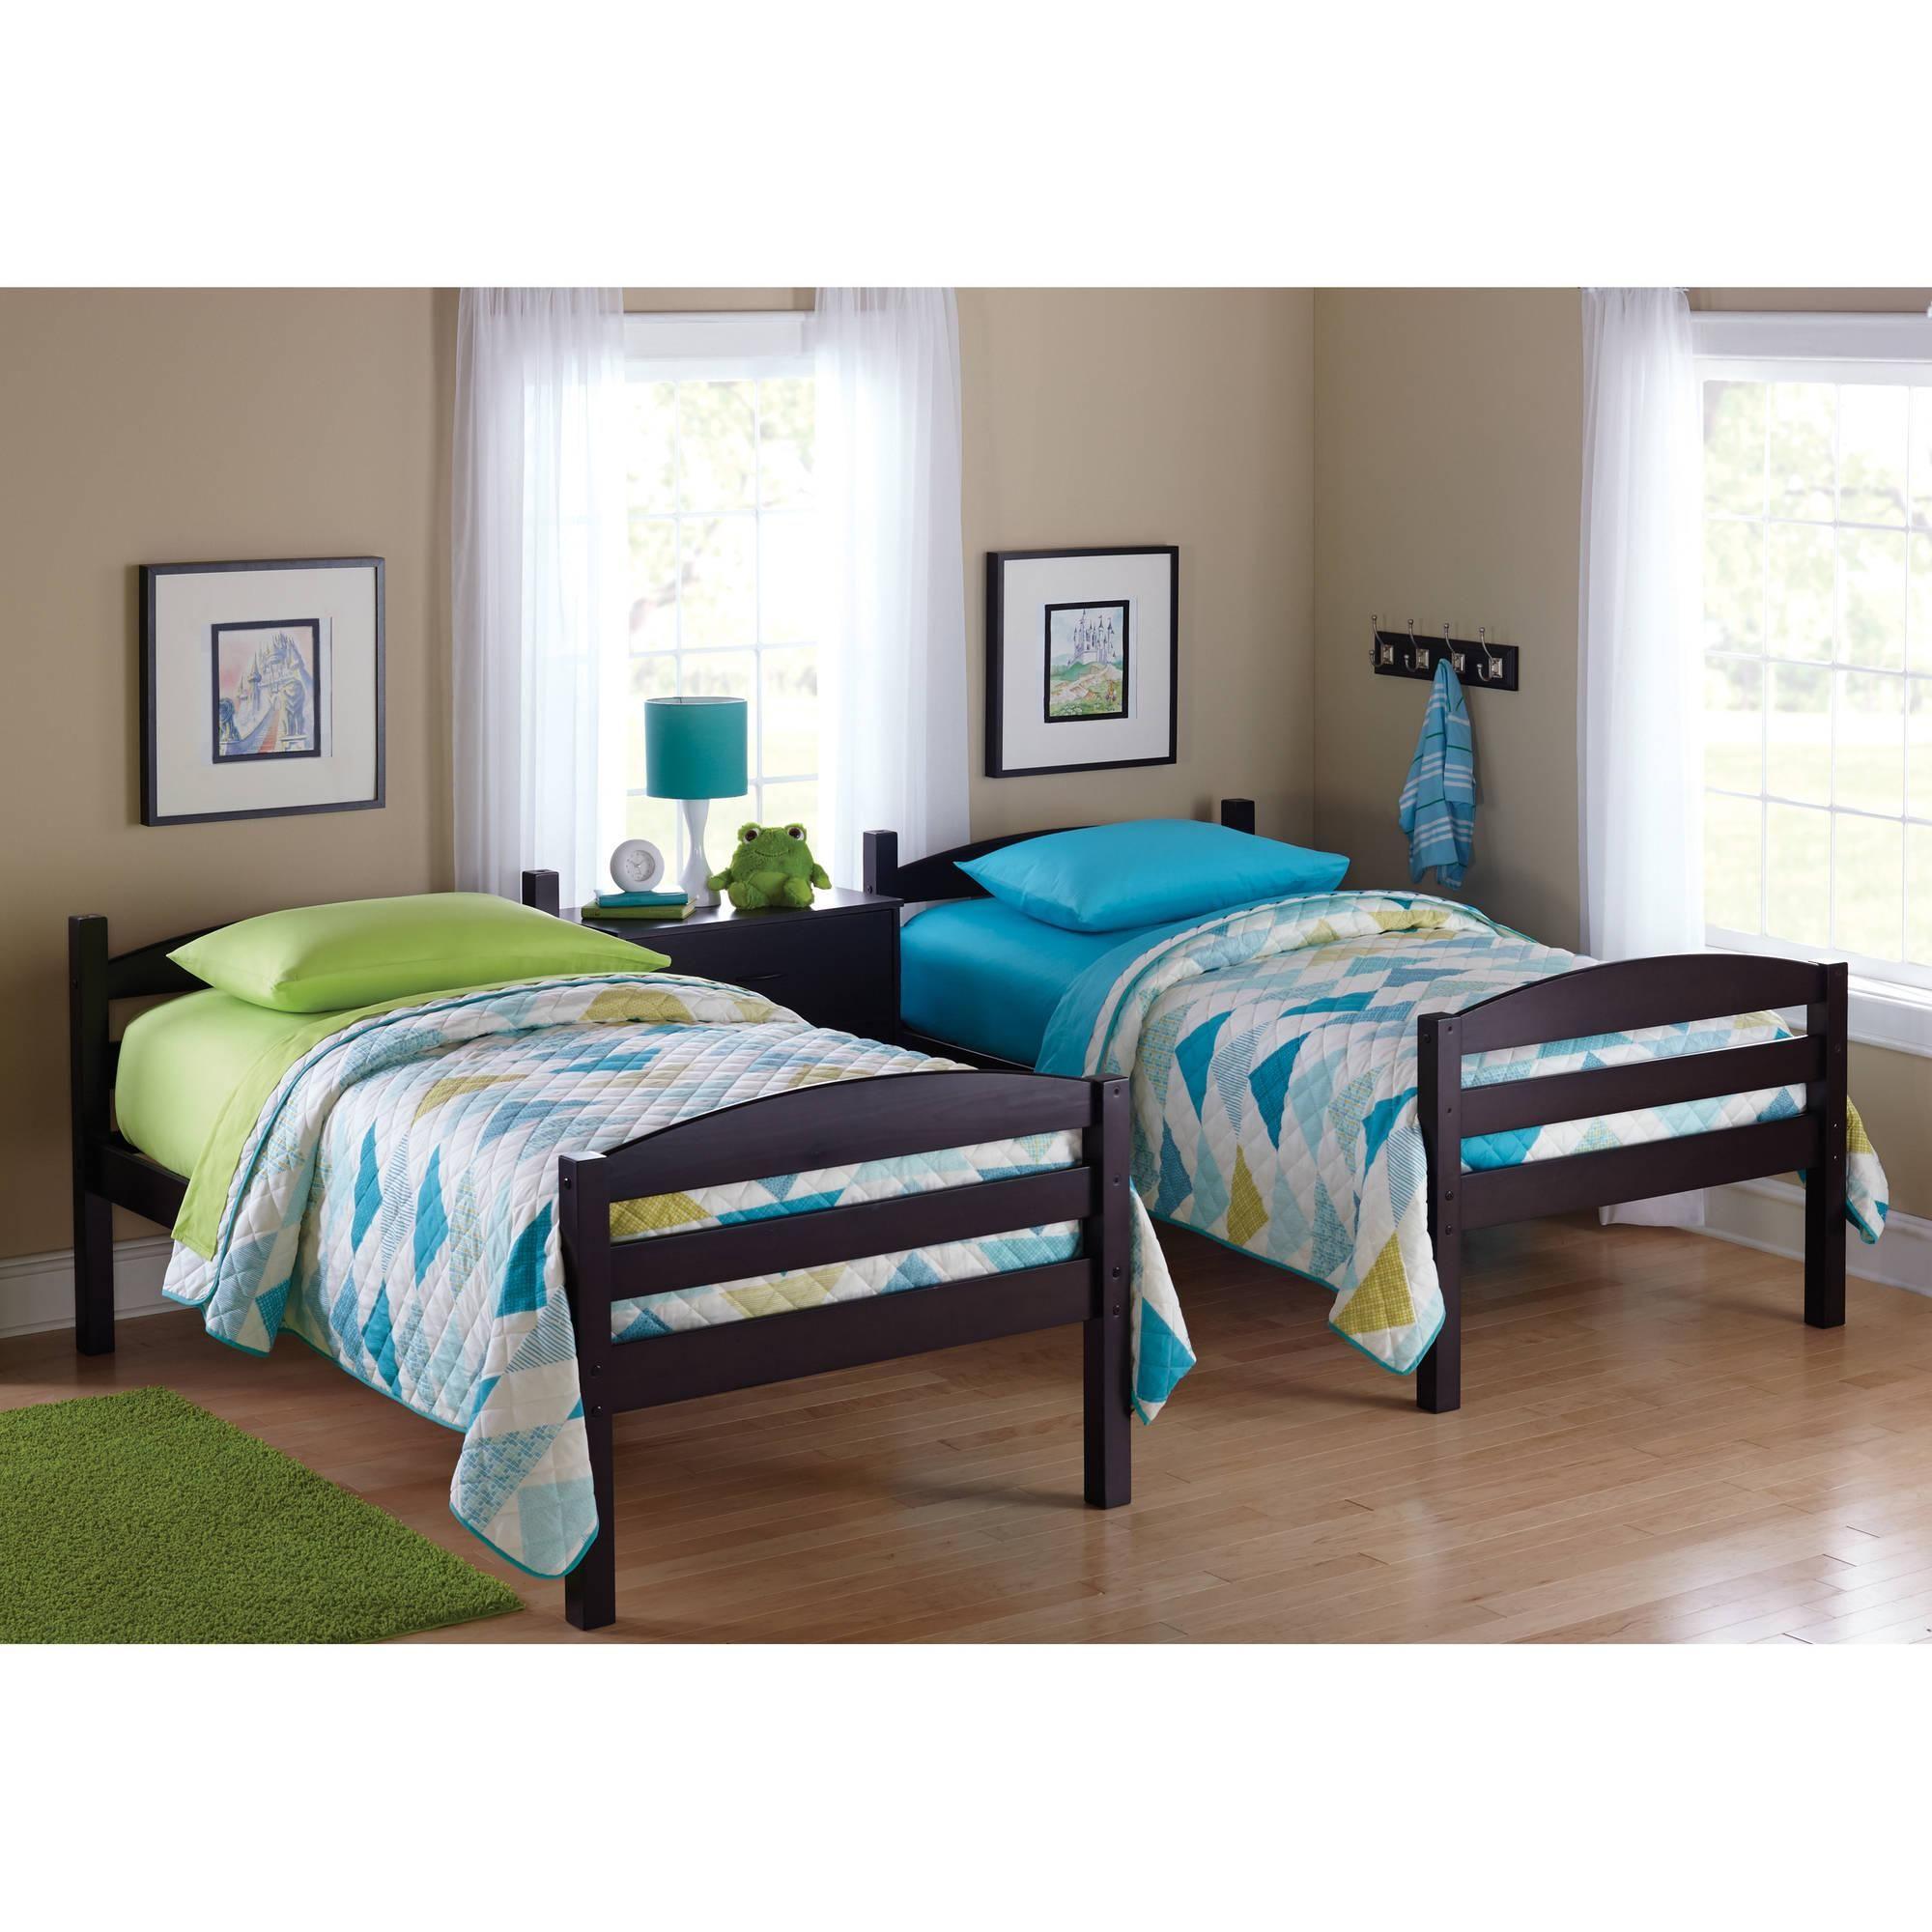 Home Childrens Bedroom Furniture Bunk Bed Designs Wood Bunk Beds